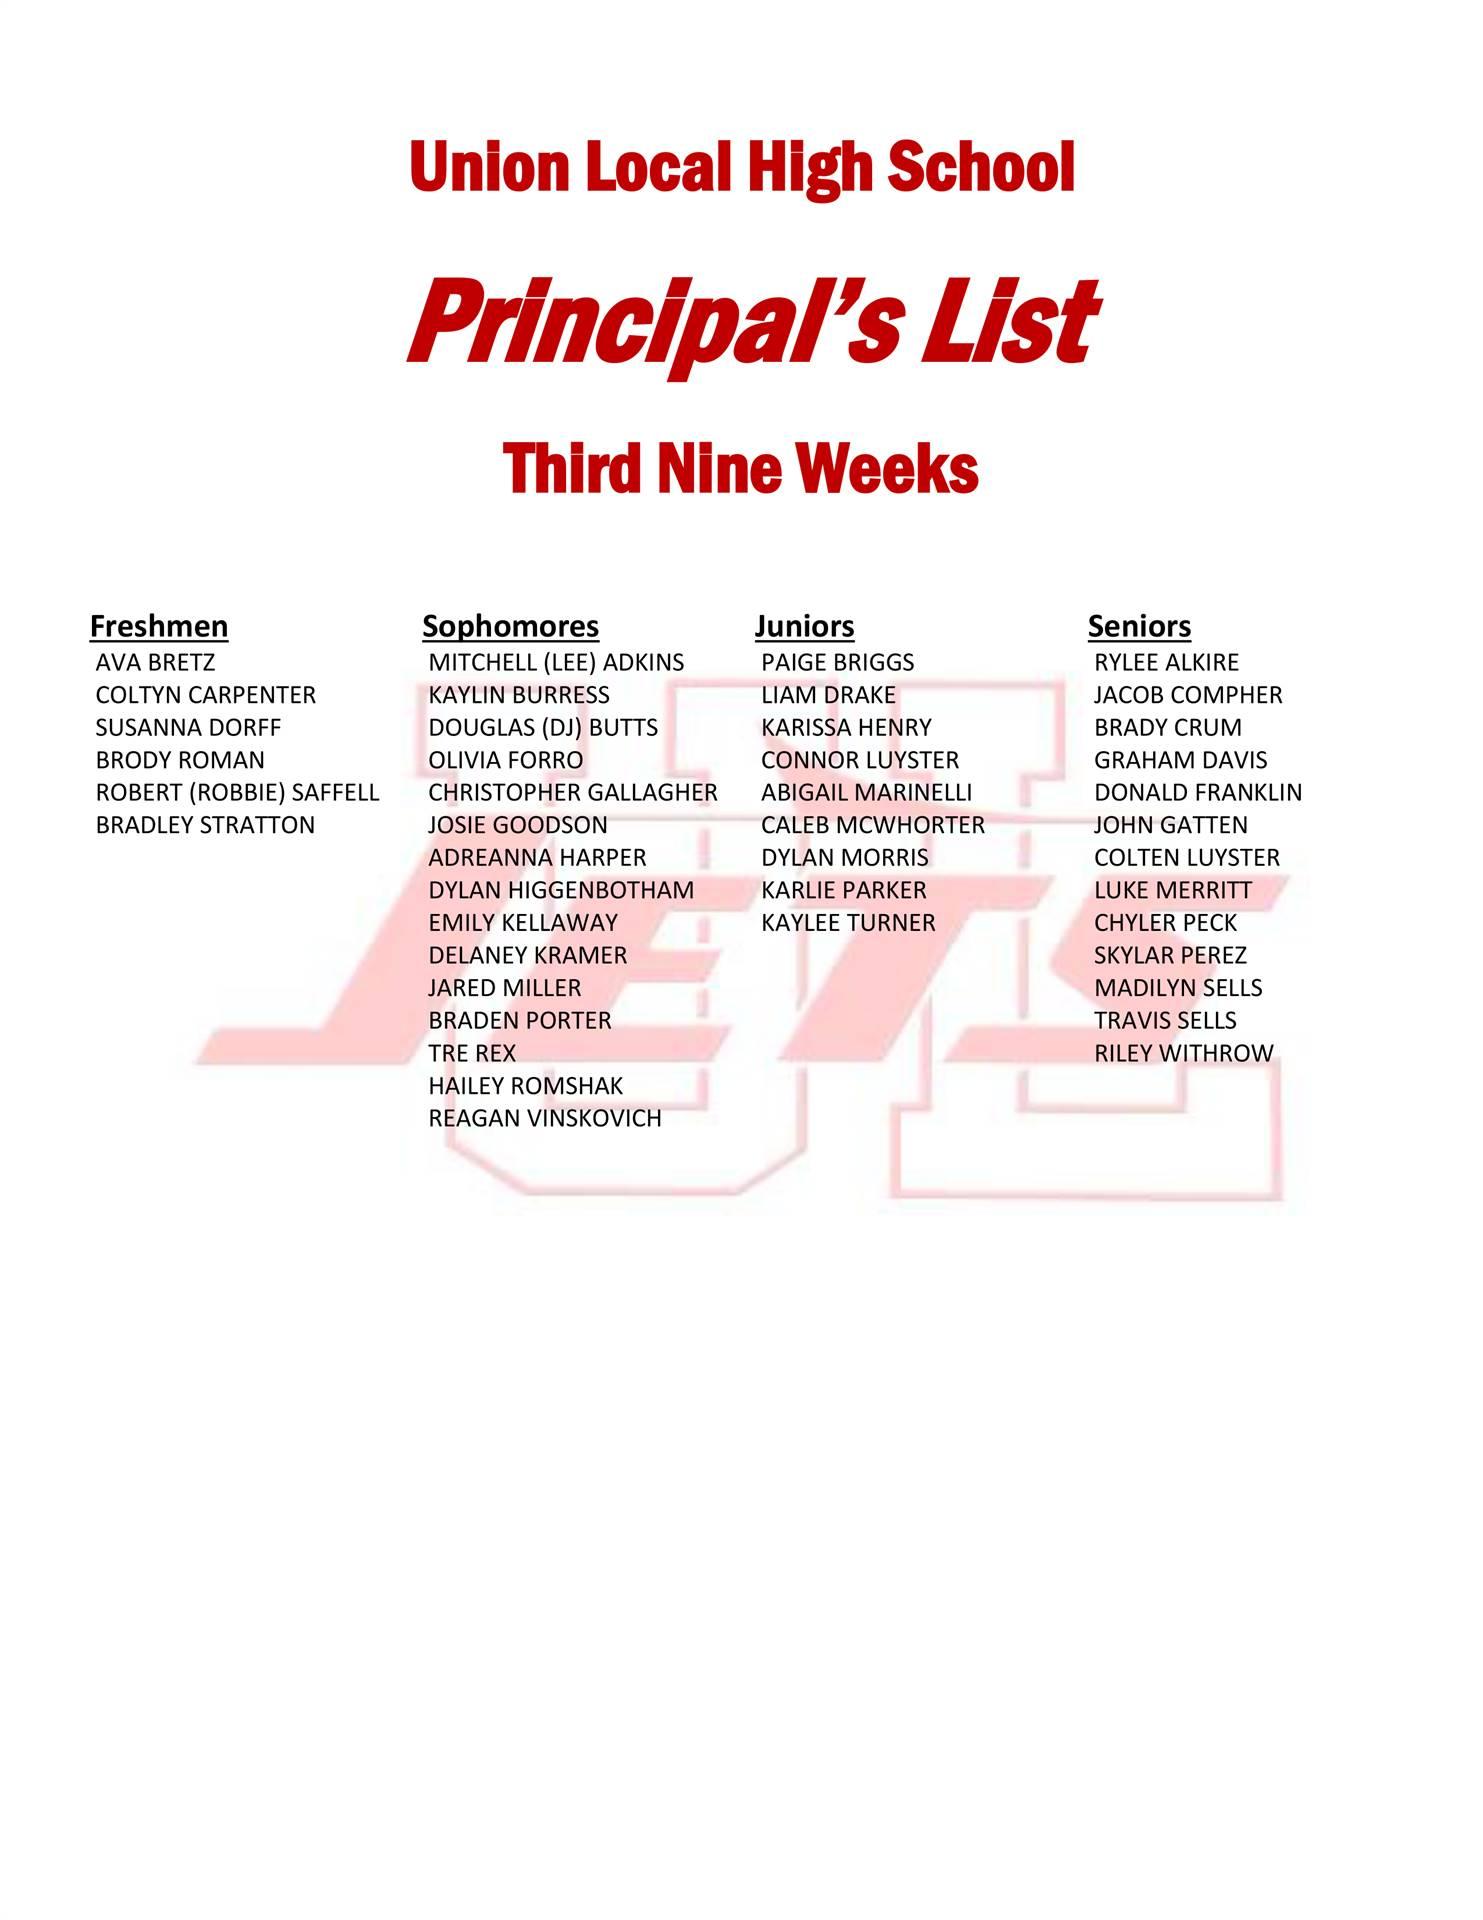 Principal's List Third Nine Weeks